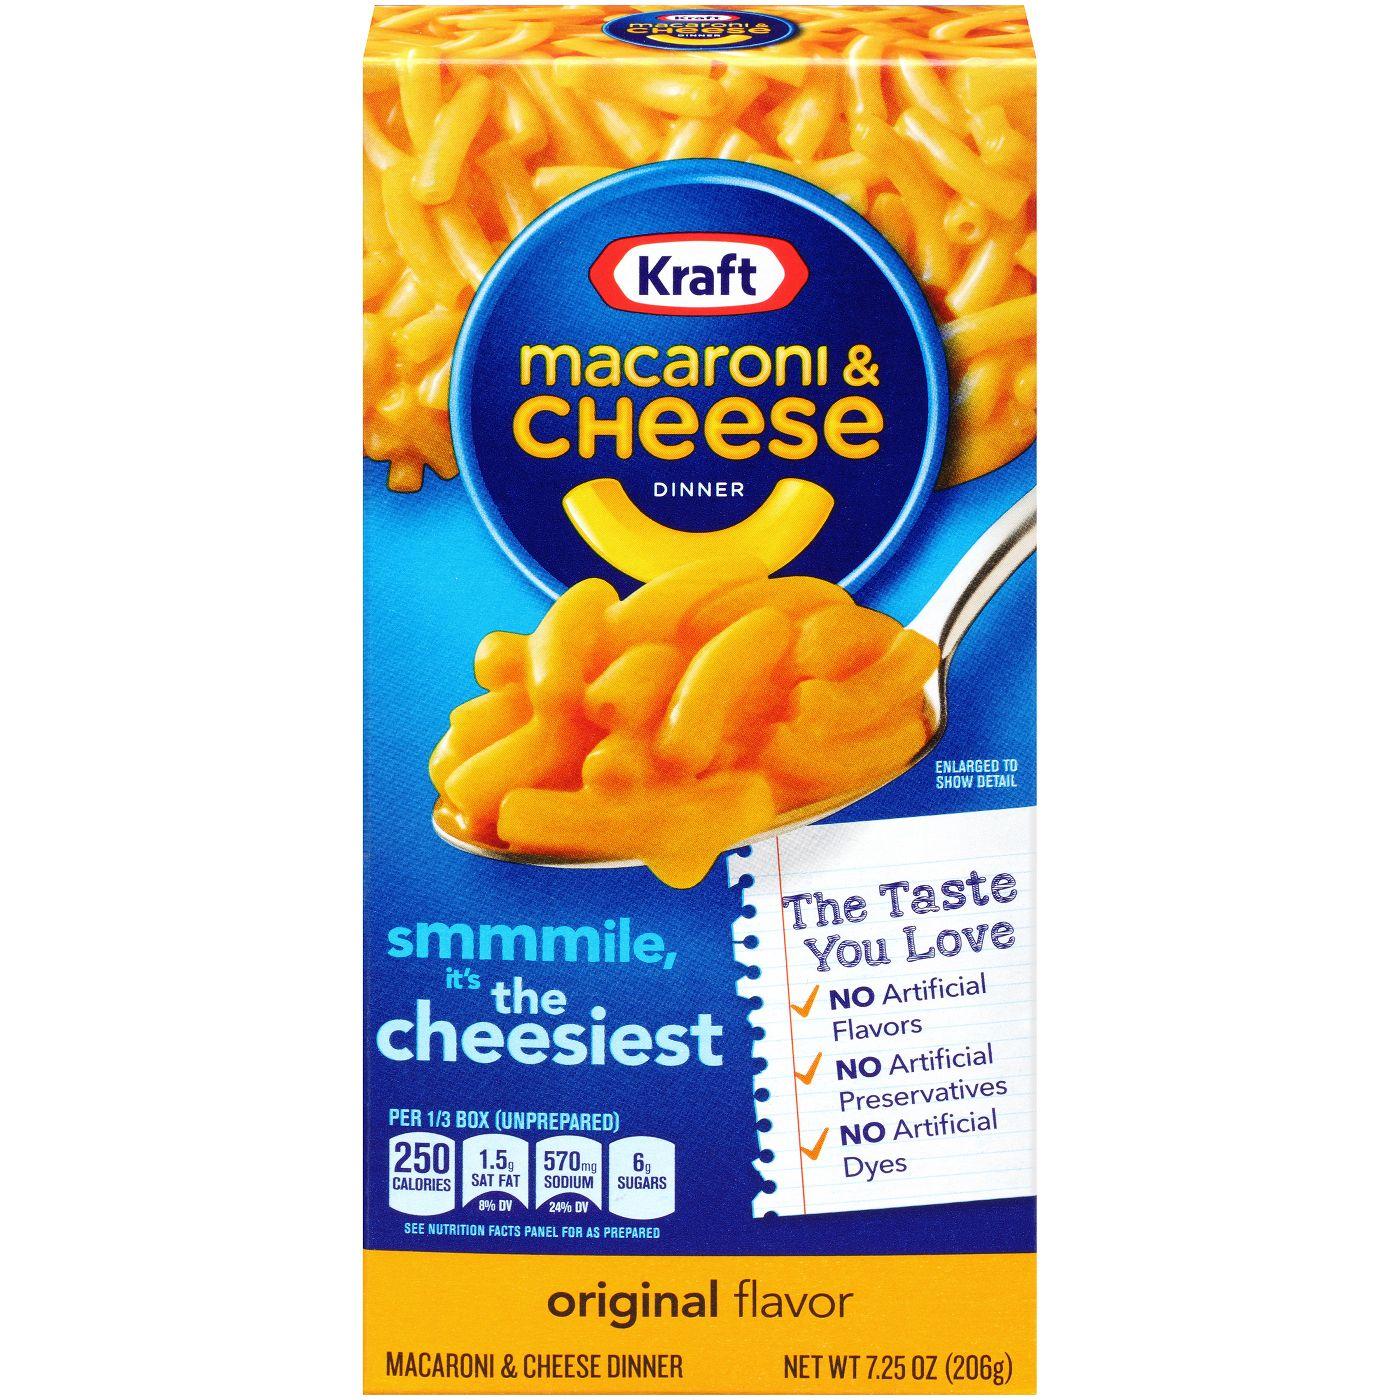 4-Pack Kraft Macaroni & Cheese Dinner Original 7.25 oz